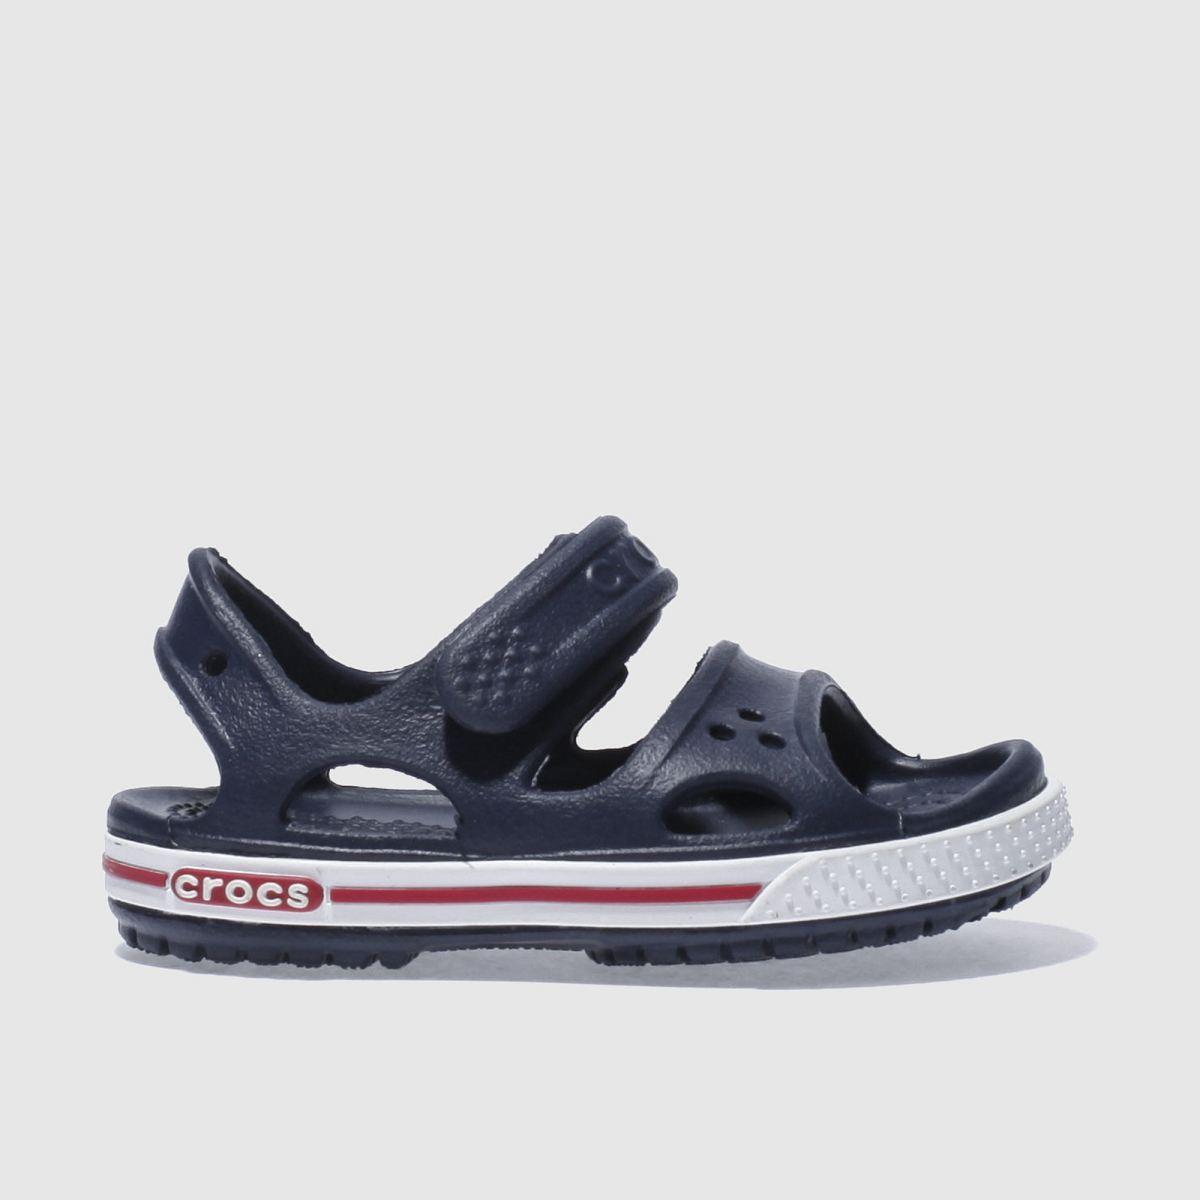 Crocs Crocs Navy & White Crocband Sandal Sandals Toddler